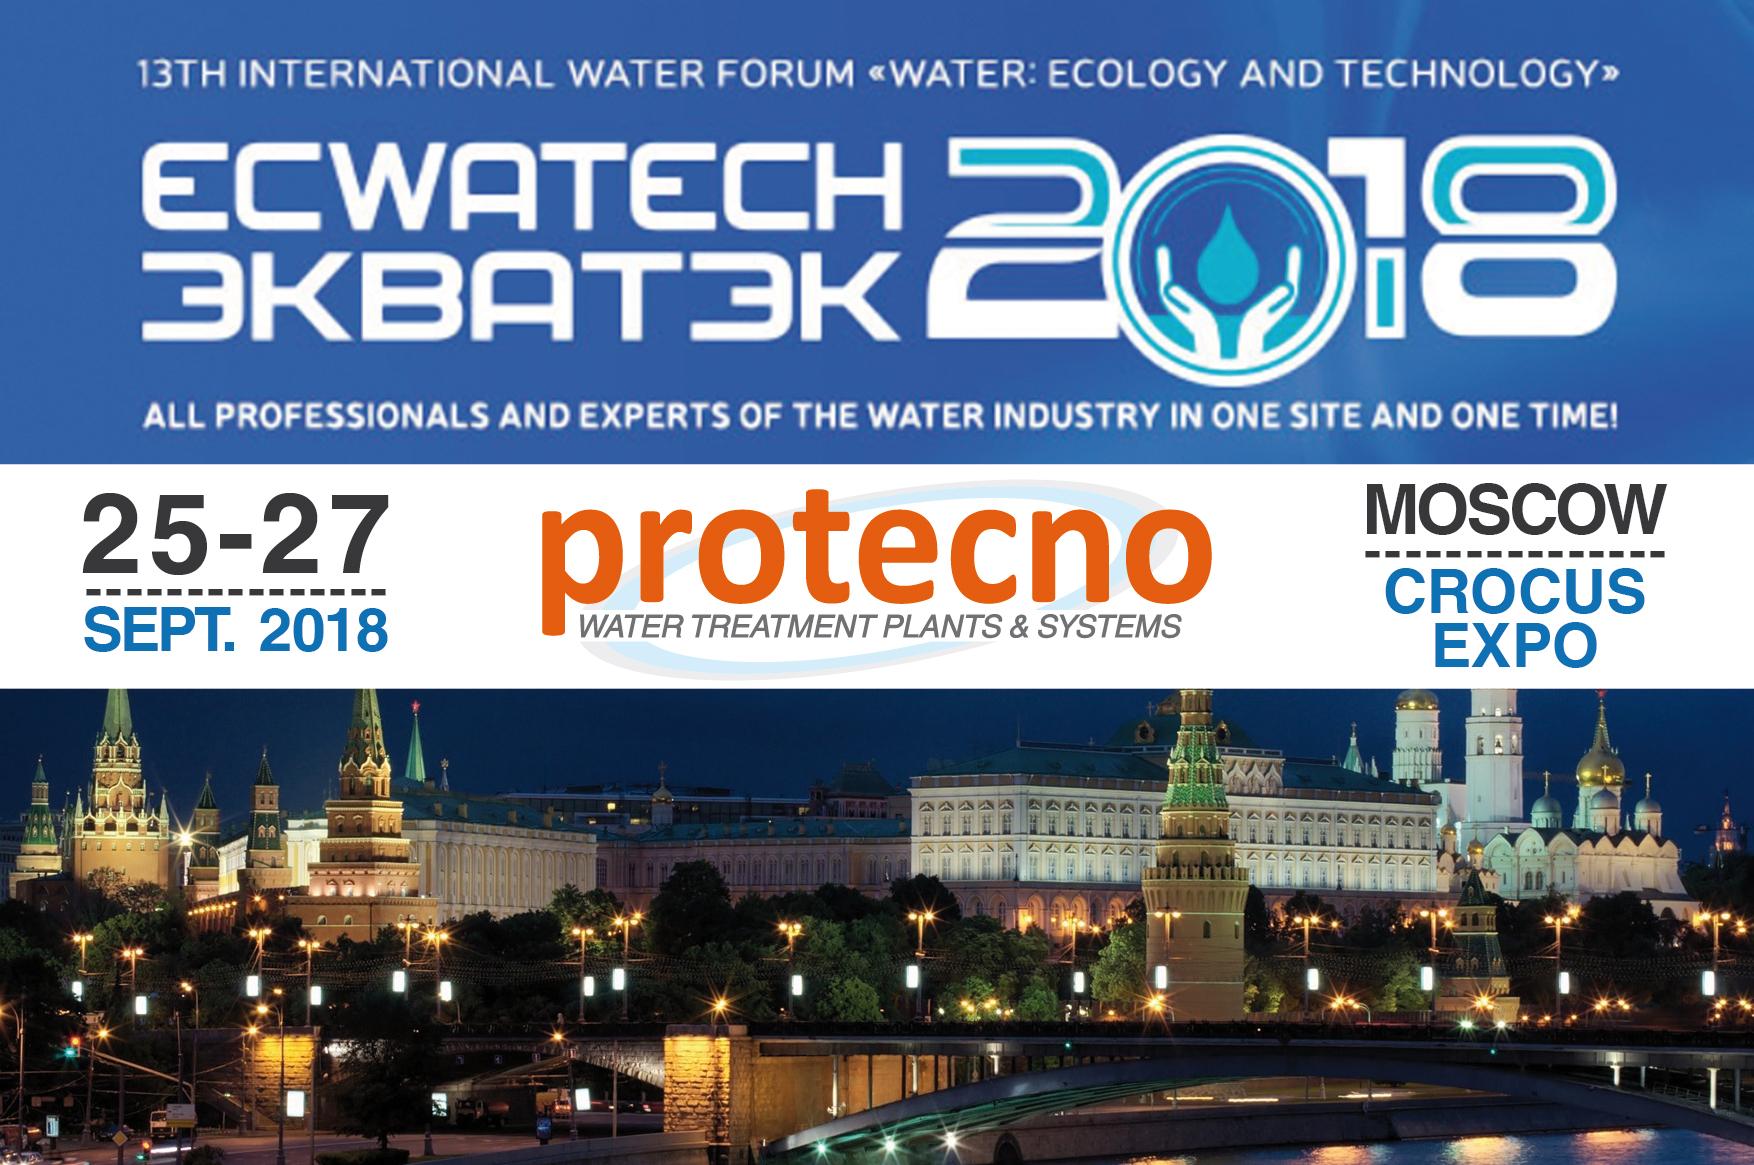 ECWATECH 2018! 25-27 September, MOSCOW